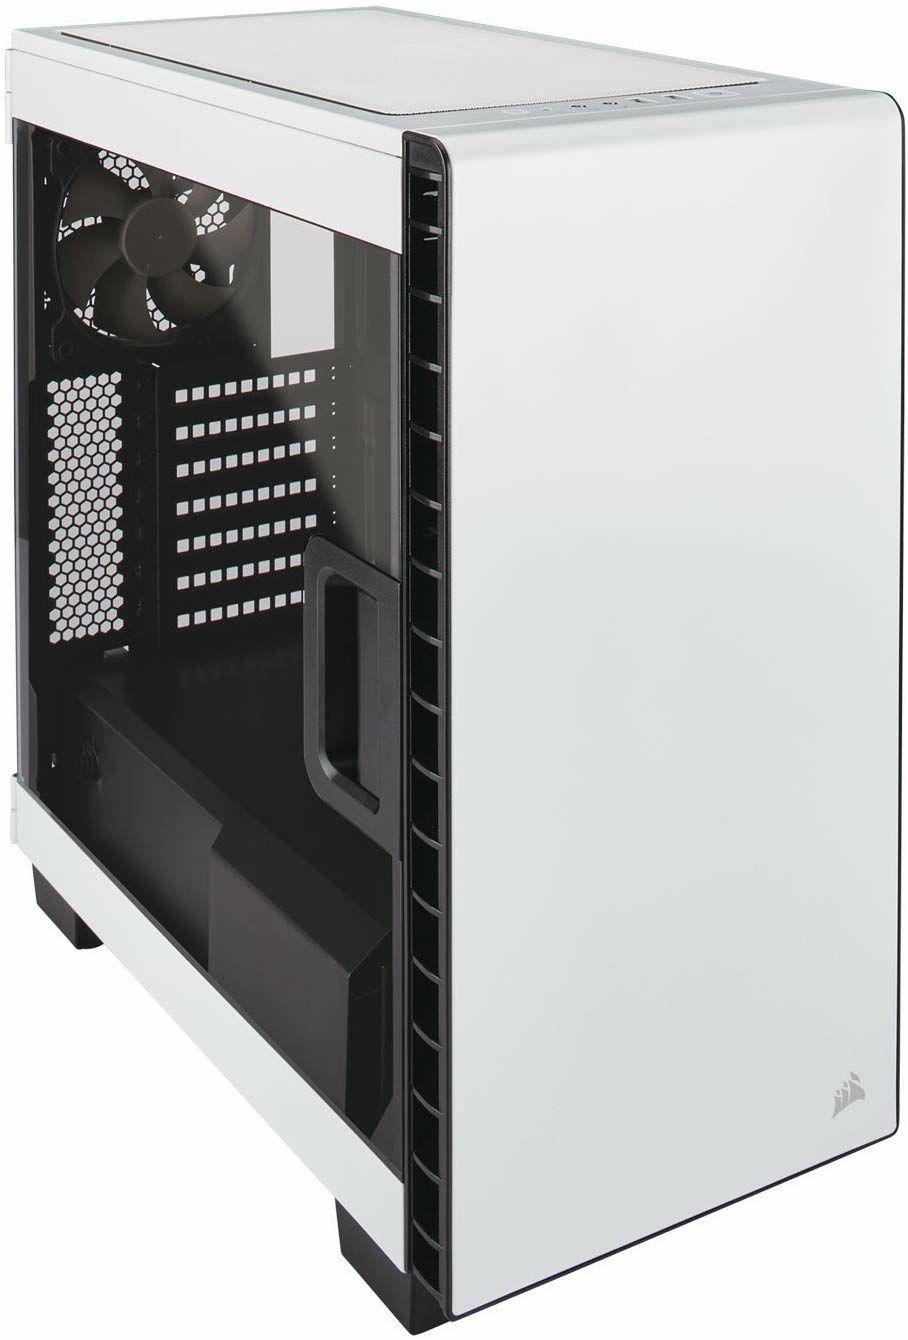 Corsair Carbide Series 400C PC-Gehäuse - Seitenfenster Midi-Tower ATX, weiß (Amazon/NBB)